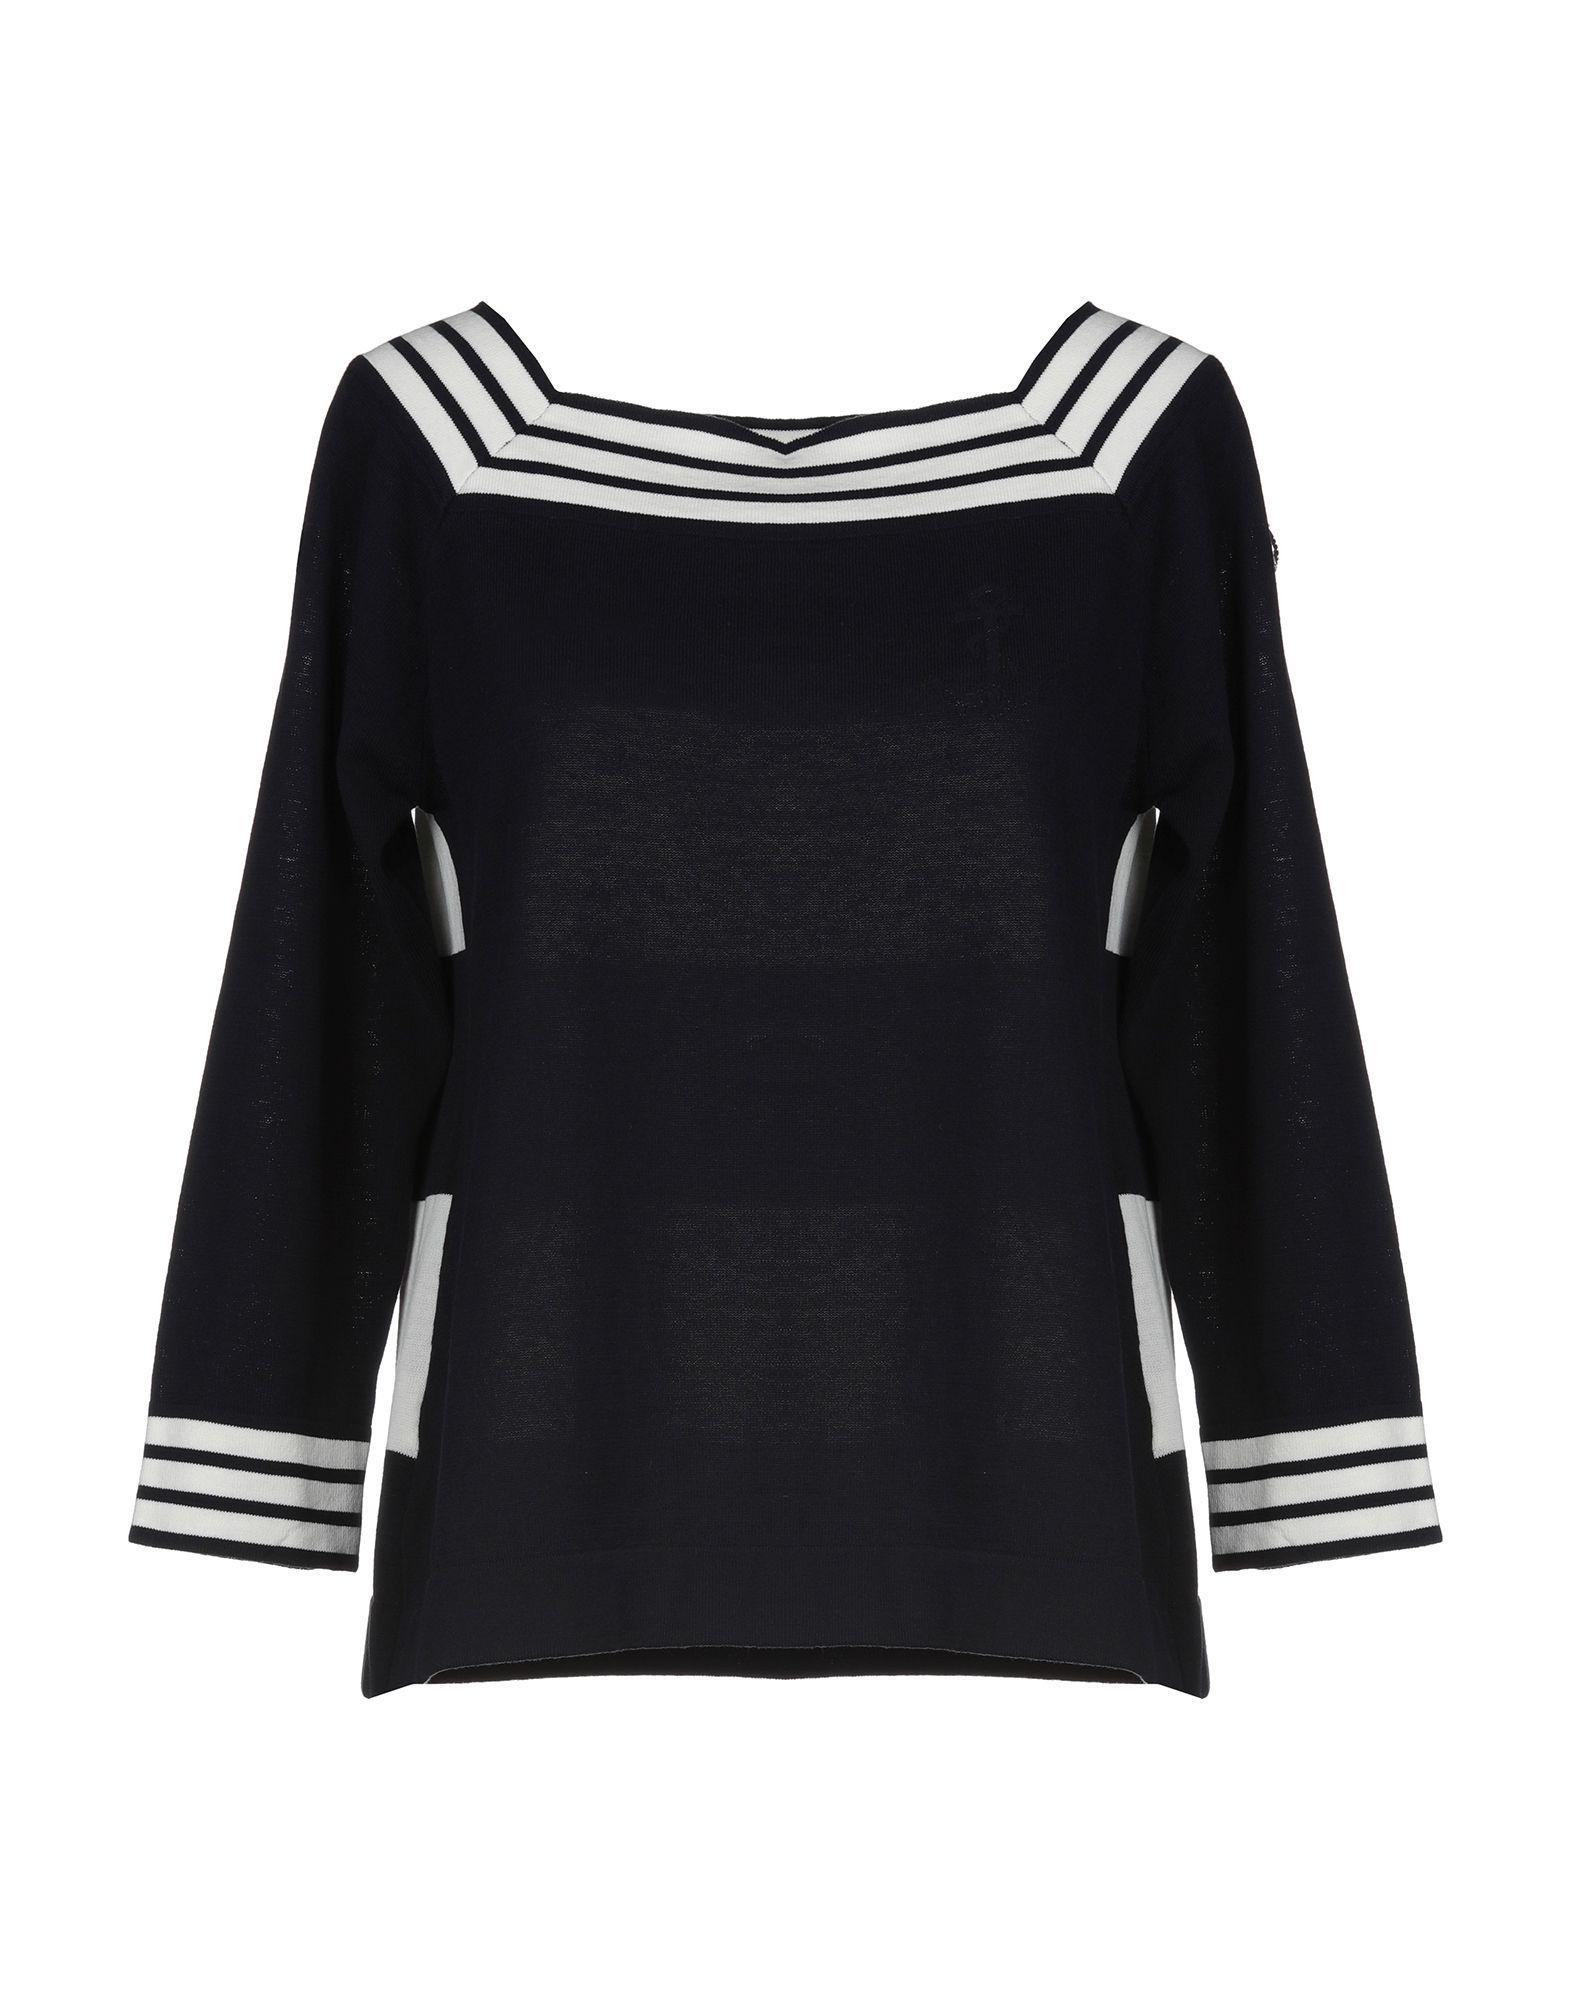 MARINA YACHTING Свитер блуза marina yachting b1 028 58626 00 65023 092